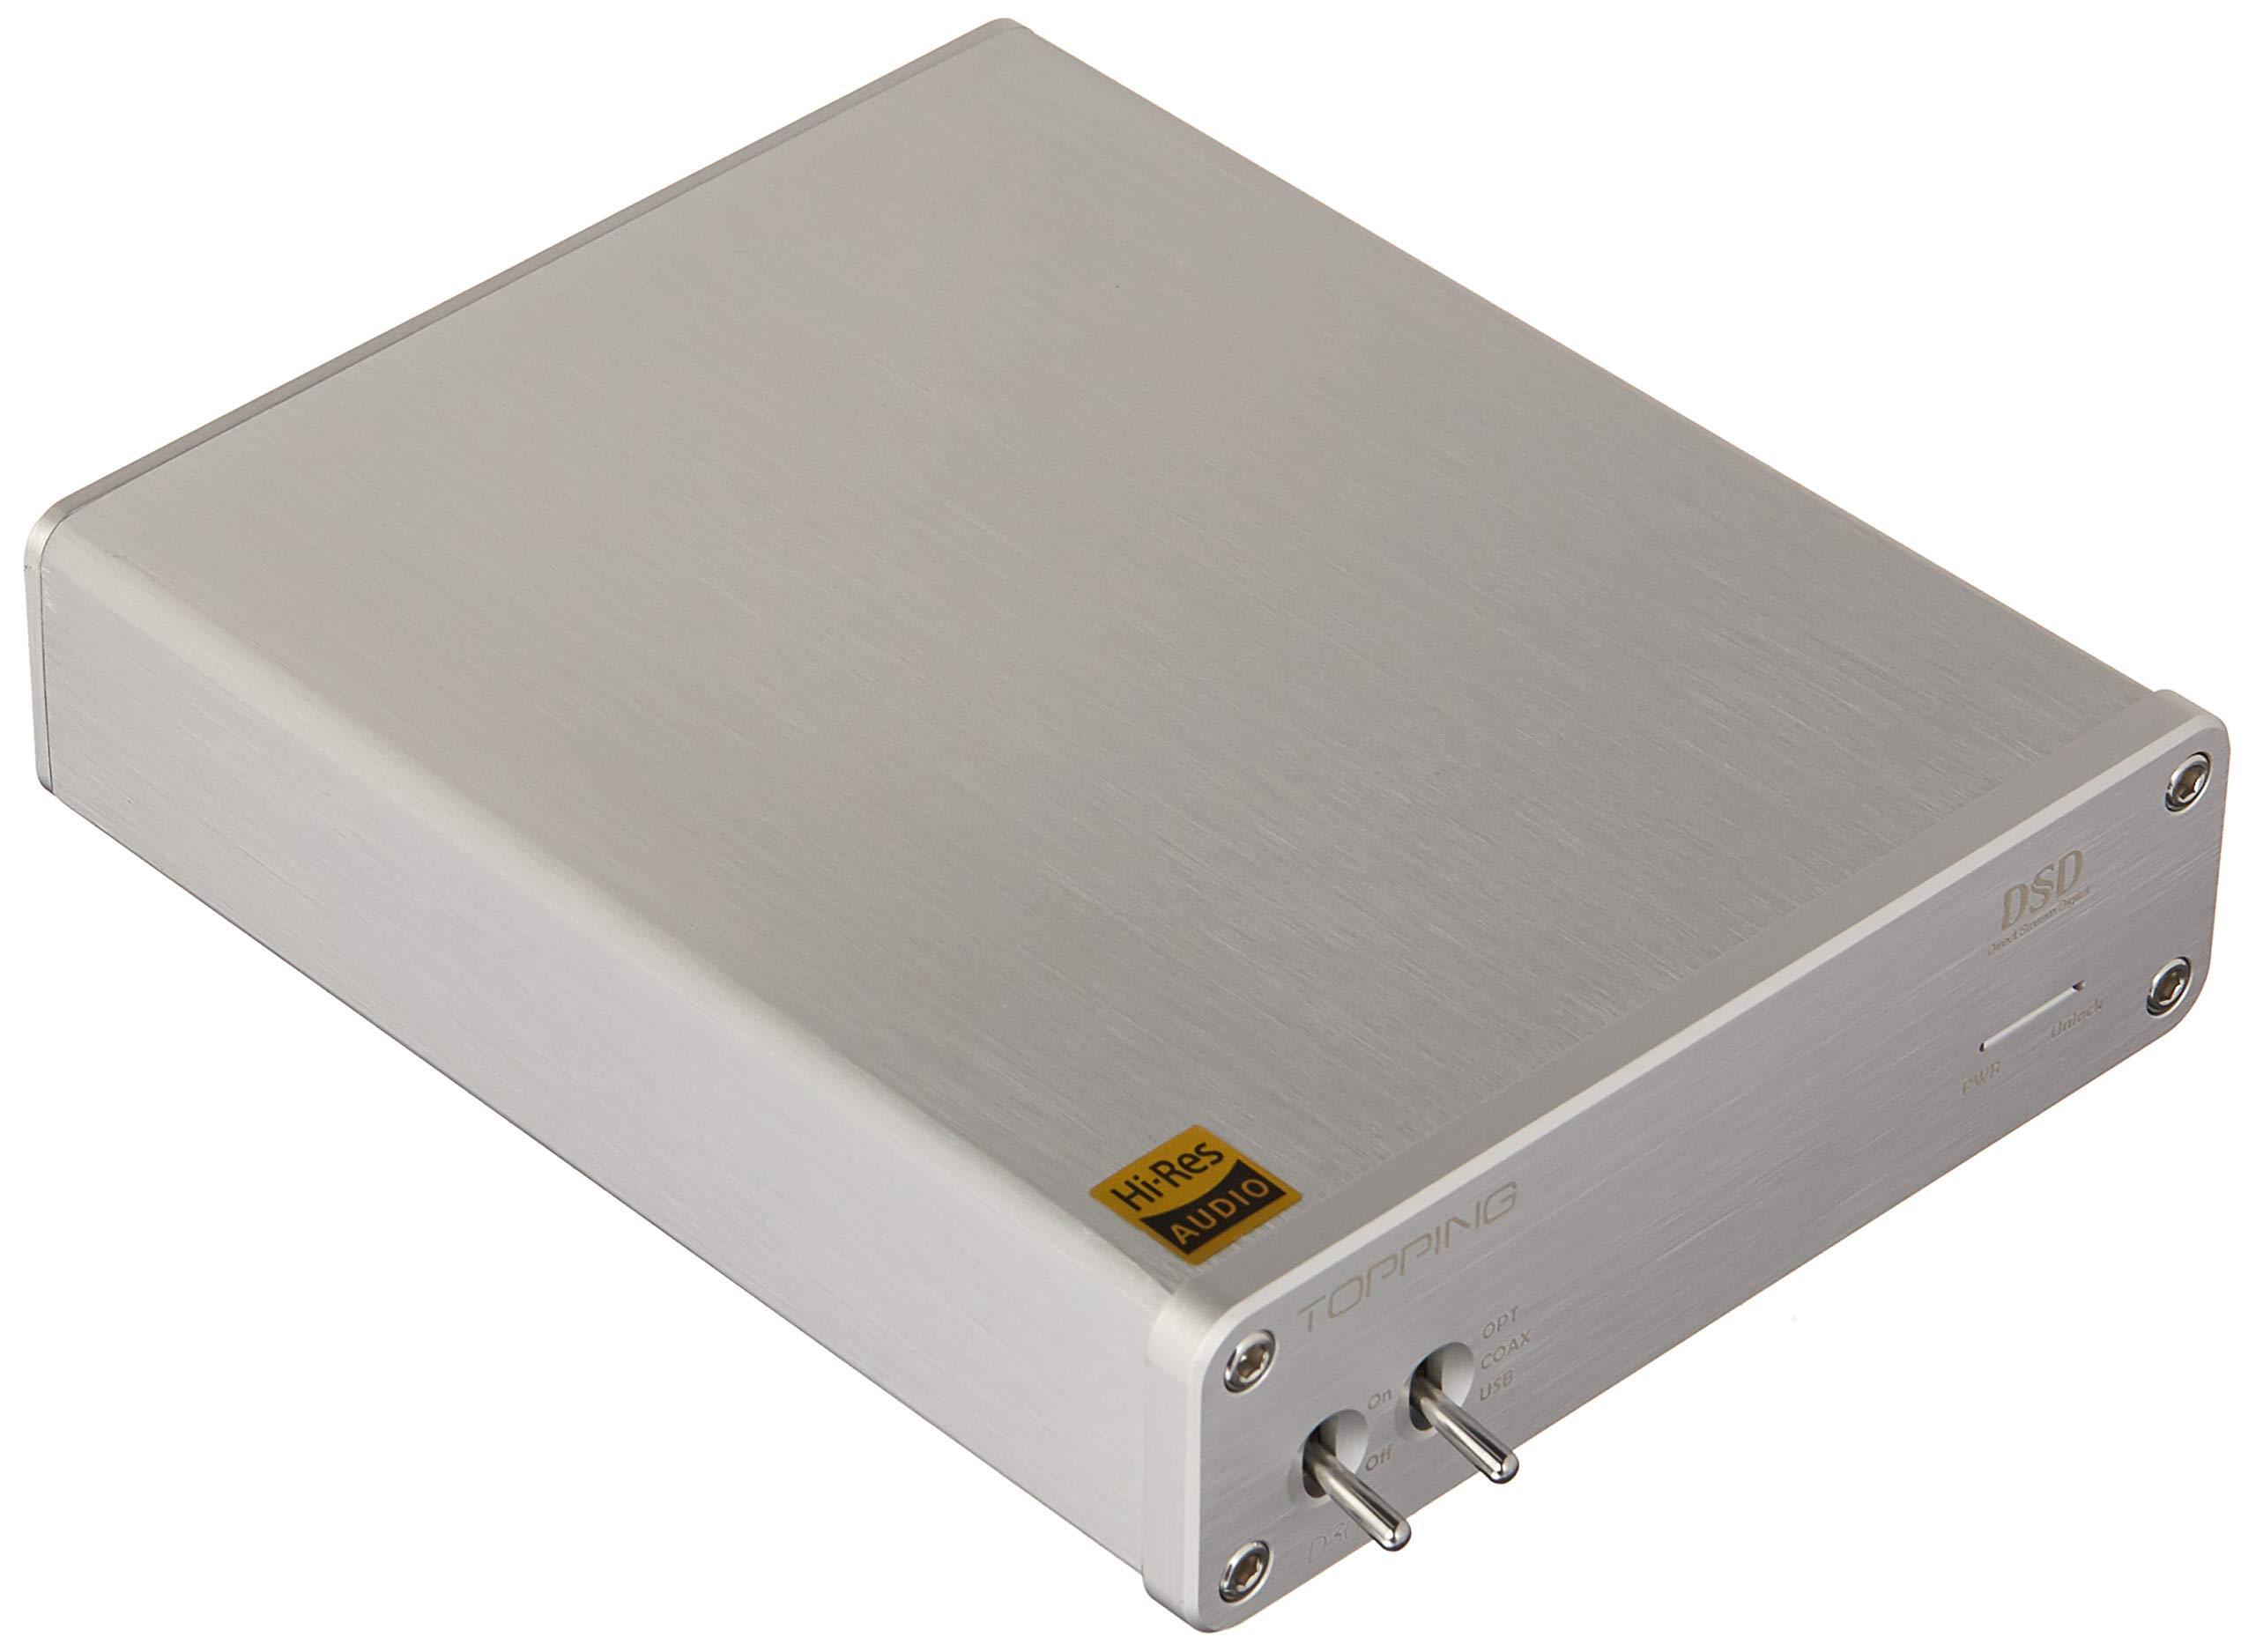 Topping D30 DSD Audio Decoder USB Coaxial Optical Fiber XMOS CS4398 24Bit 192KHz Decoder (D30 Silver) by AIMPIRE